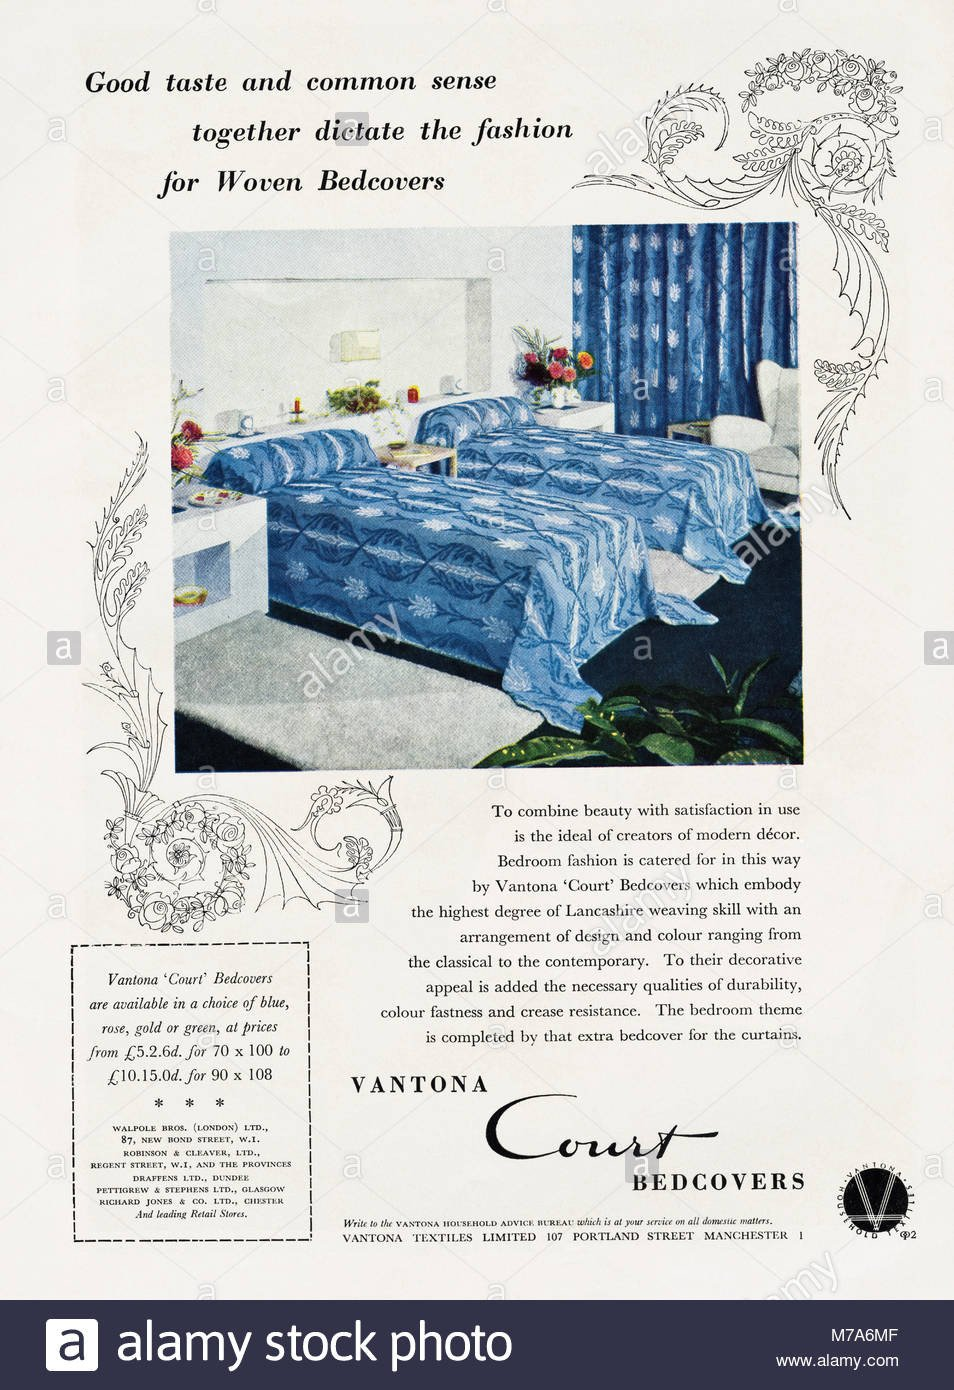 Blue and Gold Bedroom Beautiful 1950s original Old Vintage Advertisement Advertising Vantona